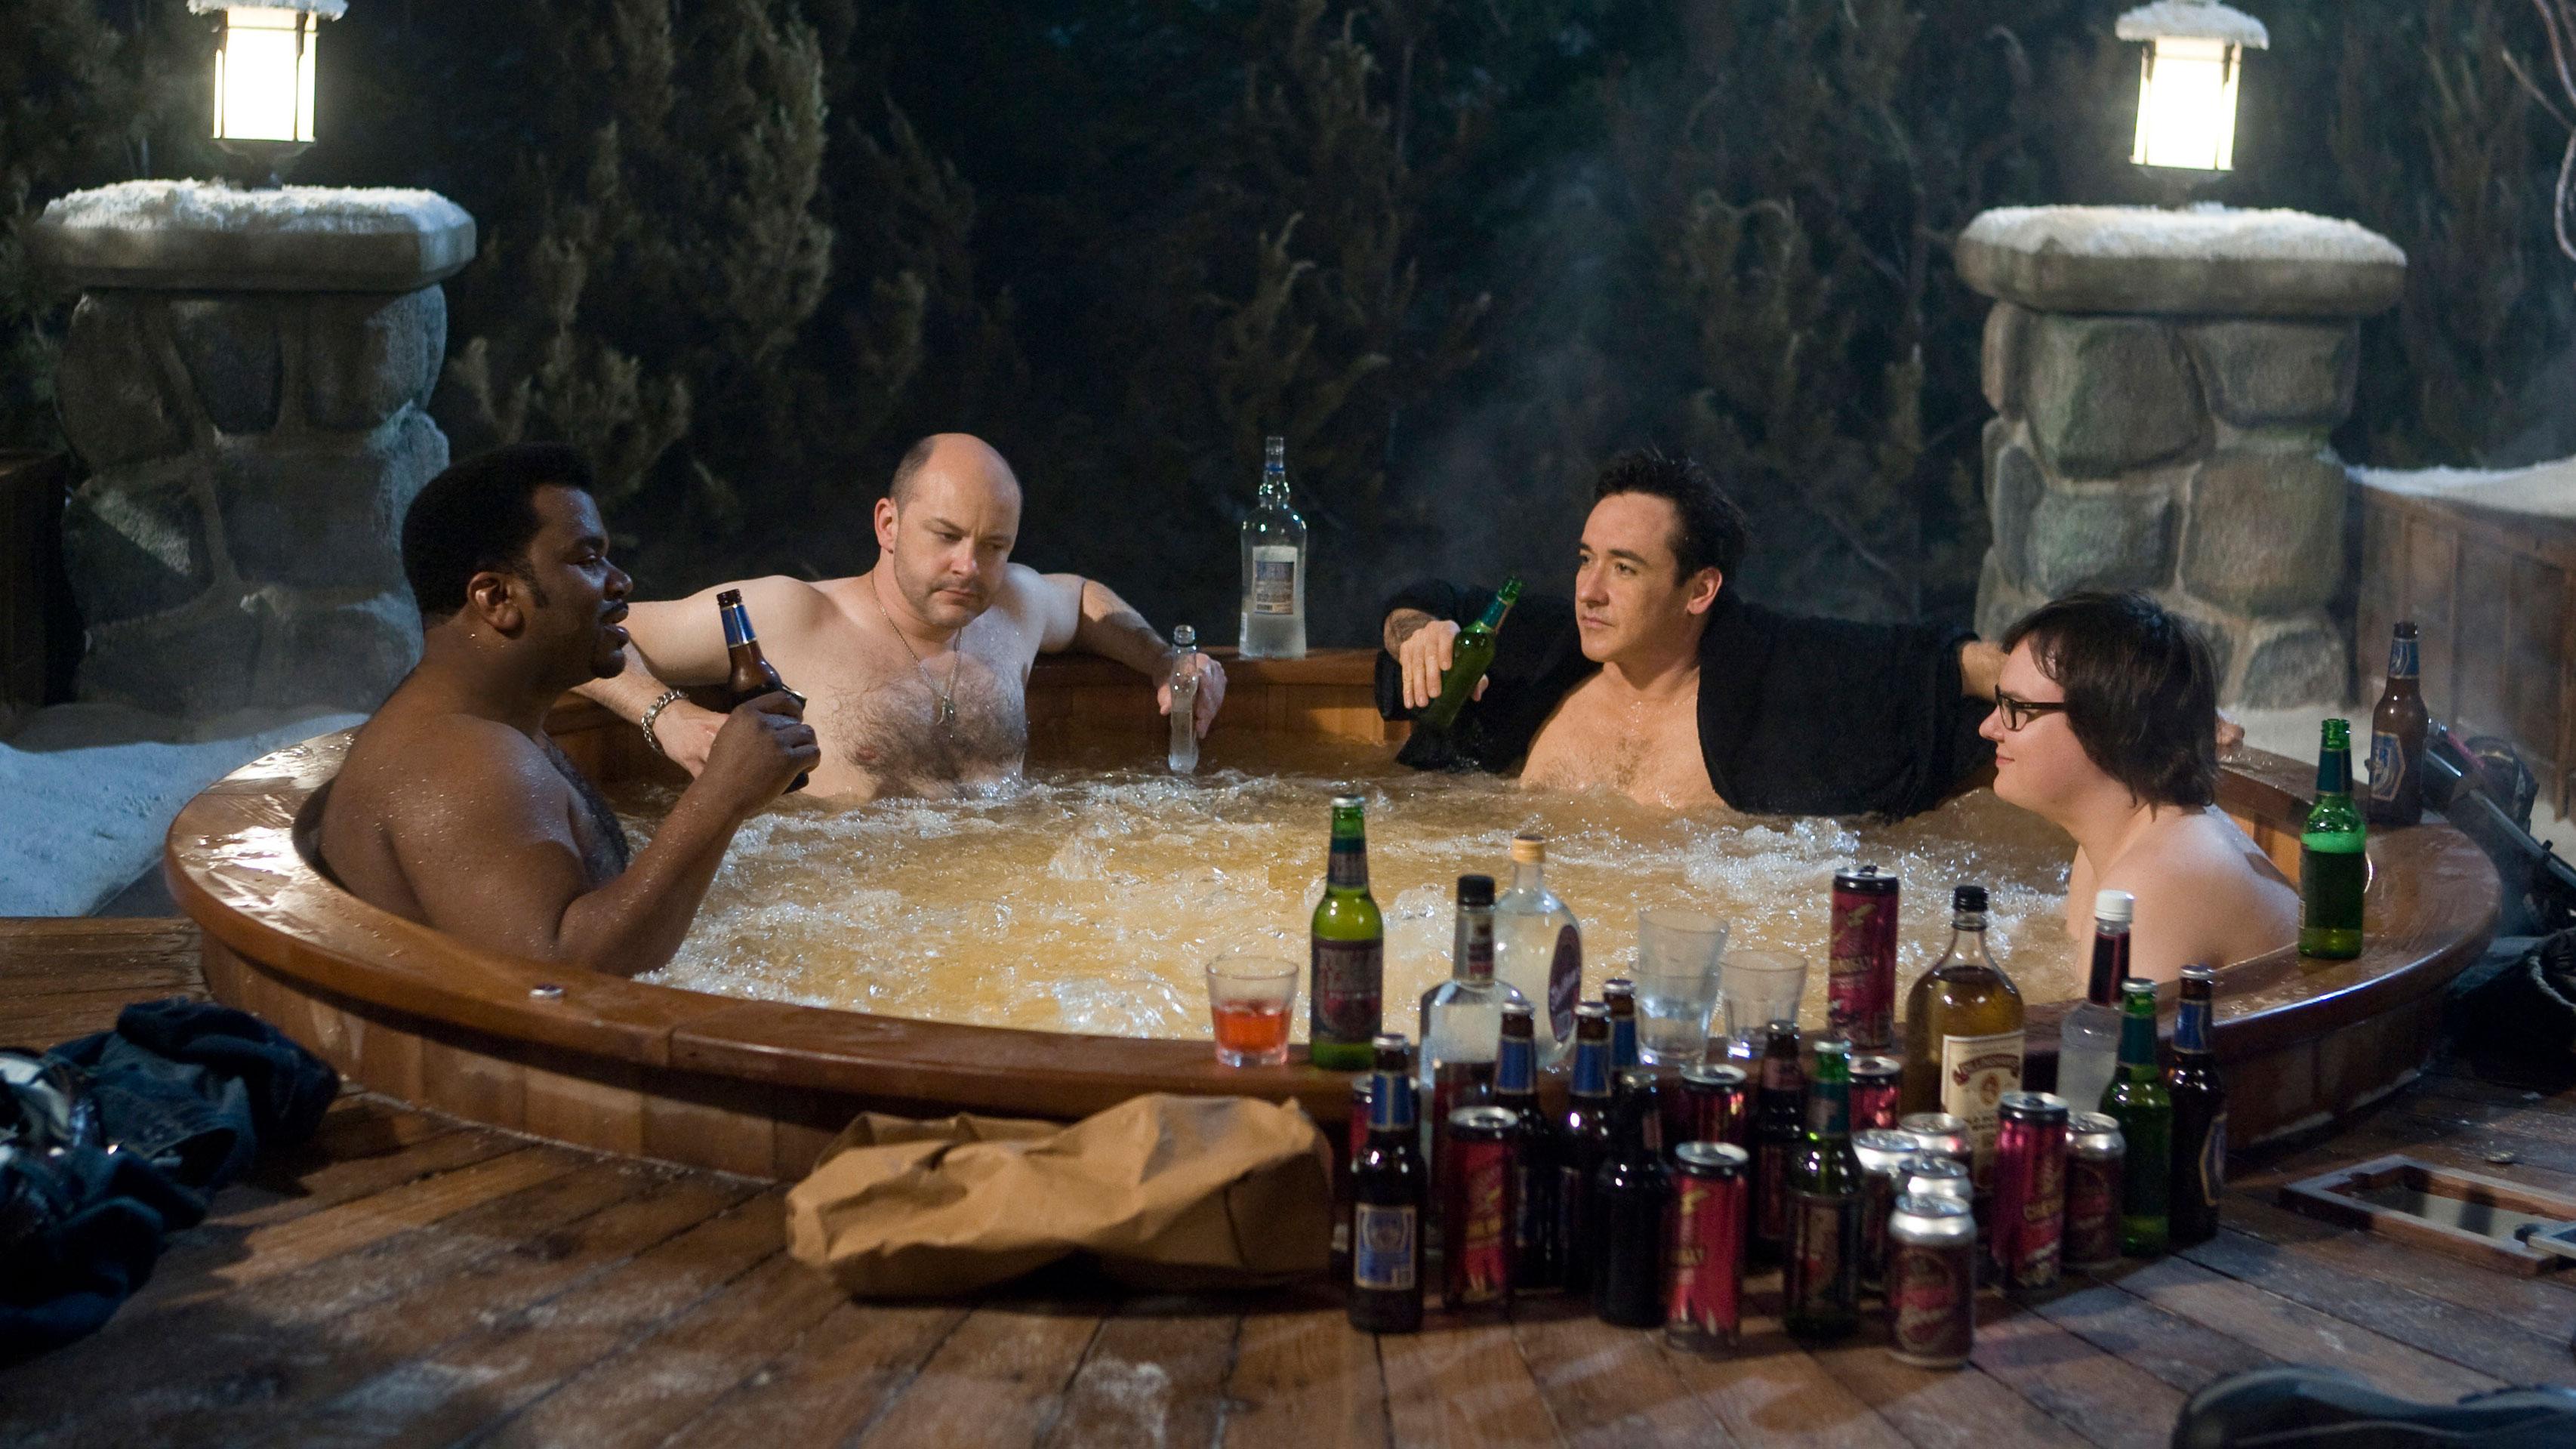 Hot Sina Dobler nudes (42 photo), Sexy, Bikini, Selfie, butt 2020